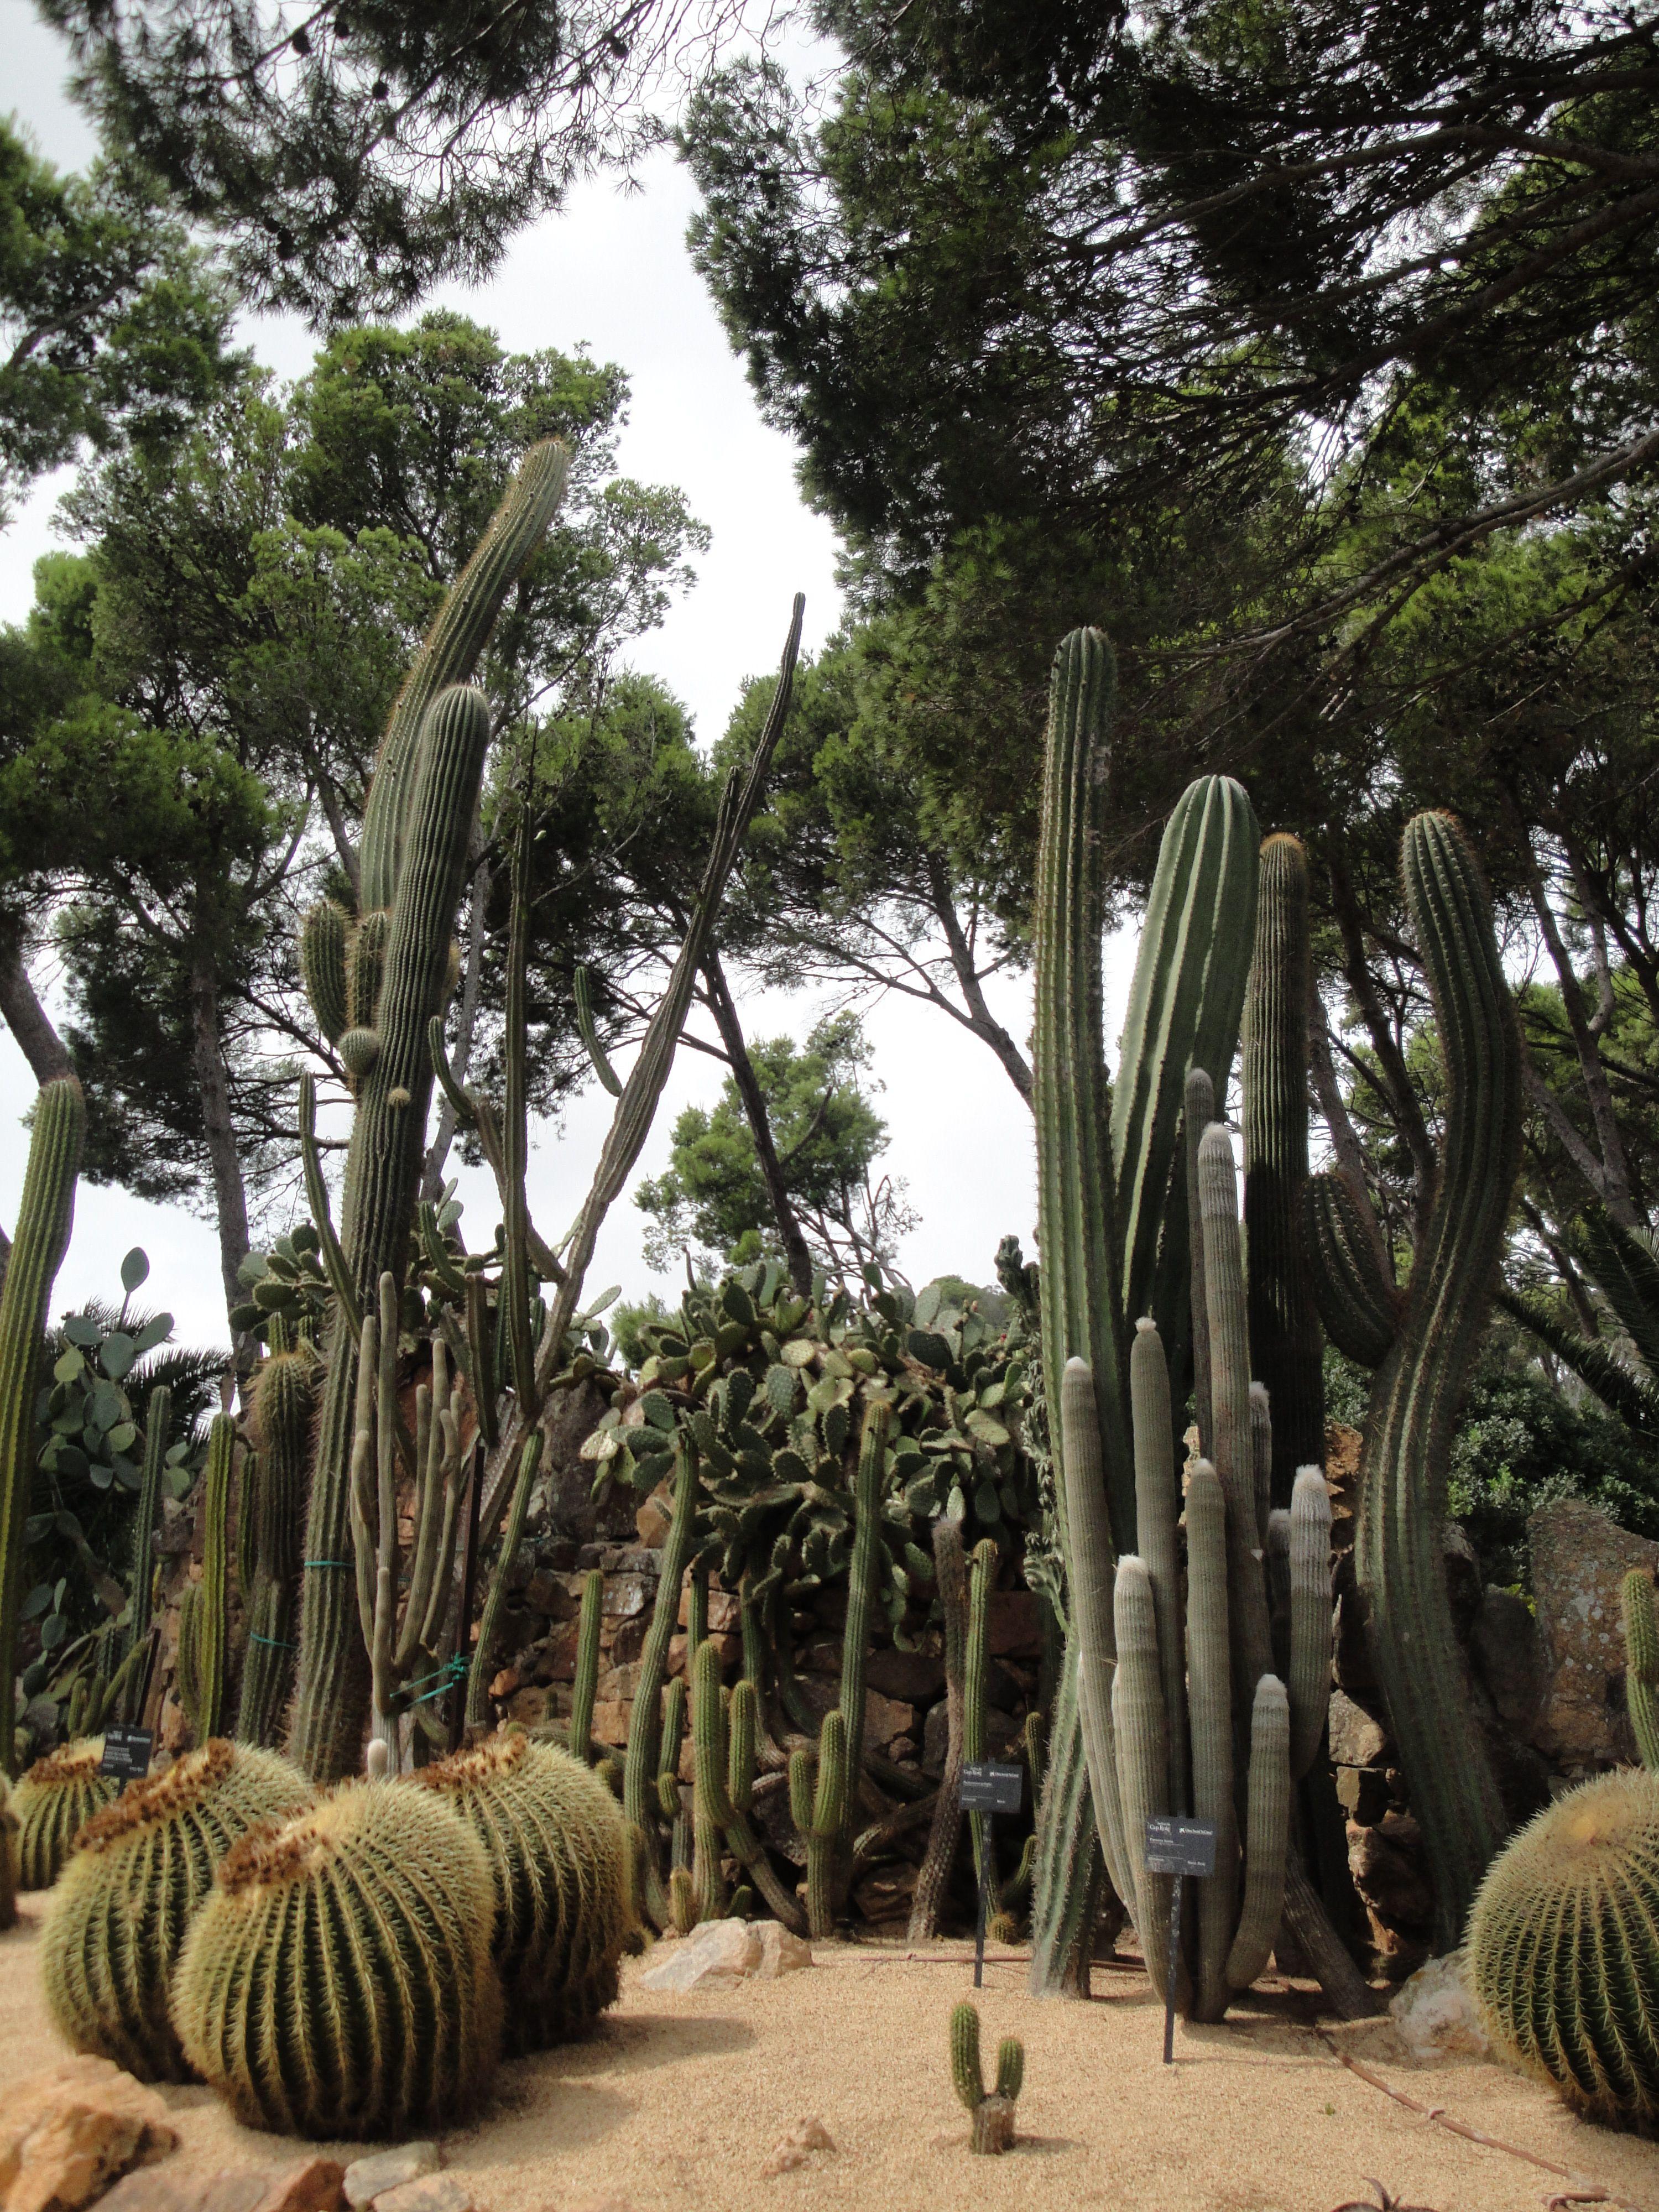 Jardins de cap roig calella de palafrugell costa brava for Jardines cap roig